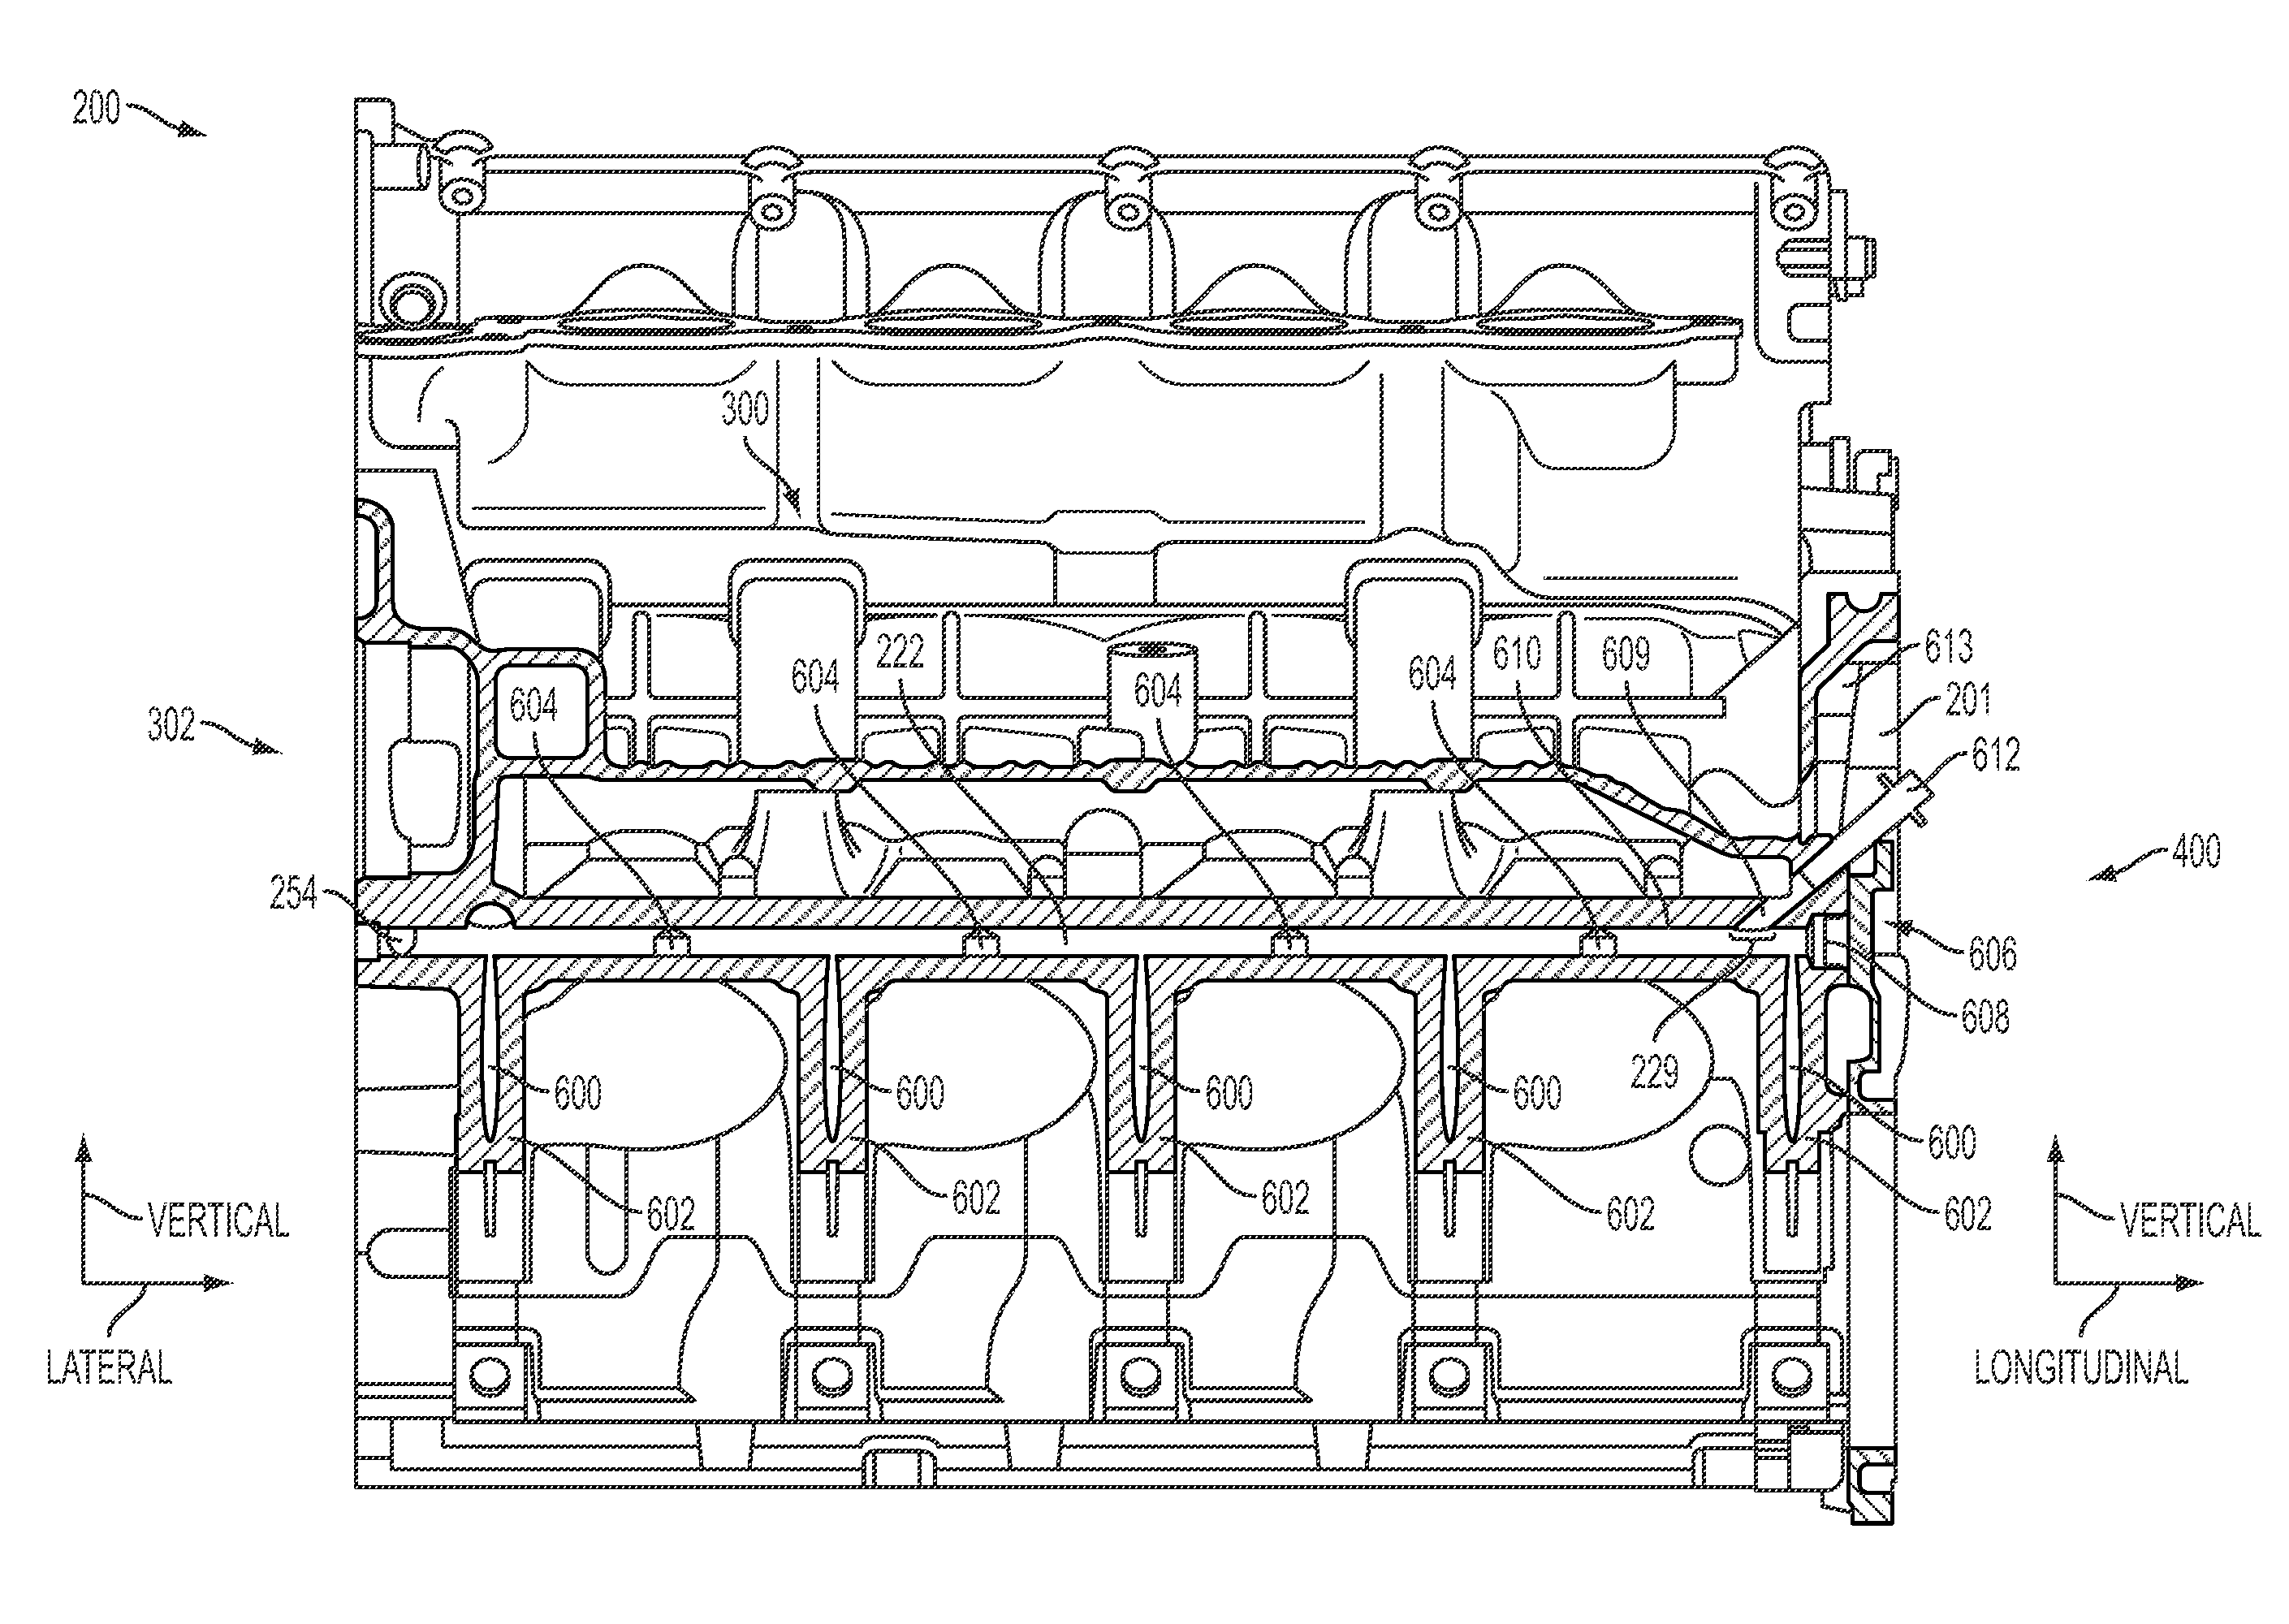 engine lubrication diagram 2000 jeep grand cherokee laredo